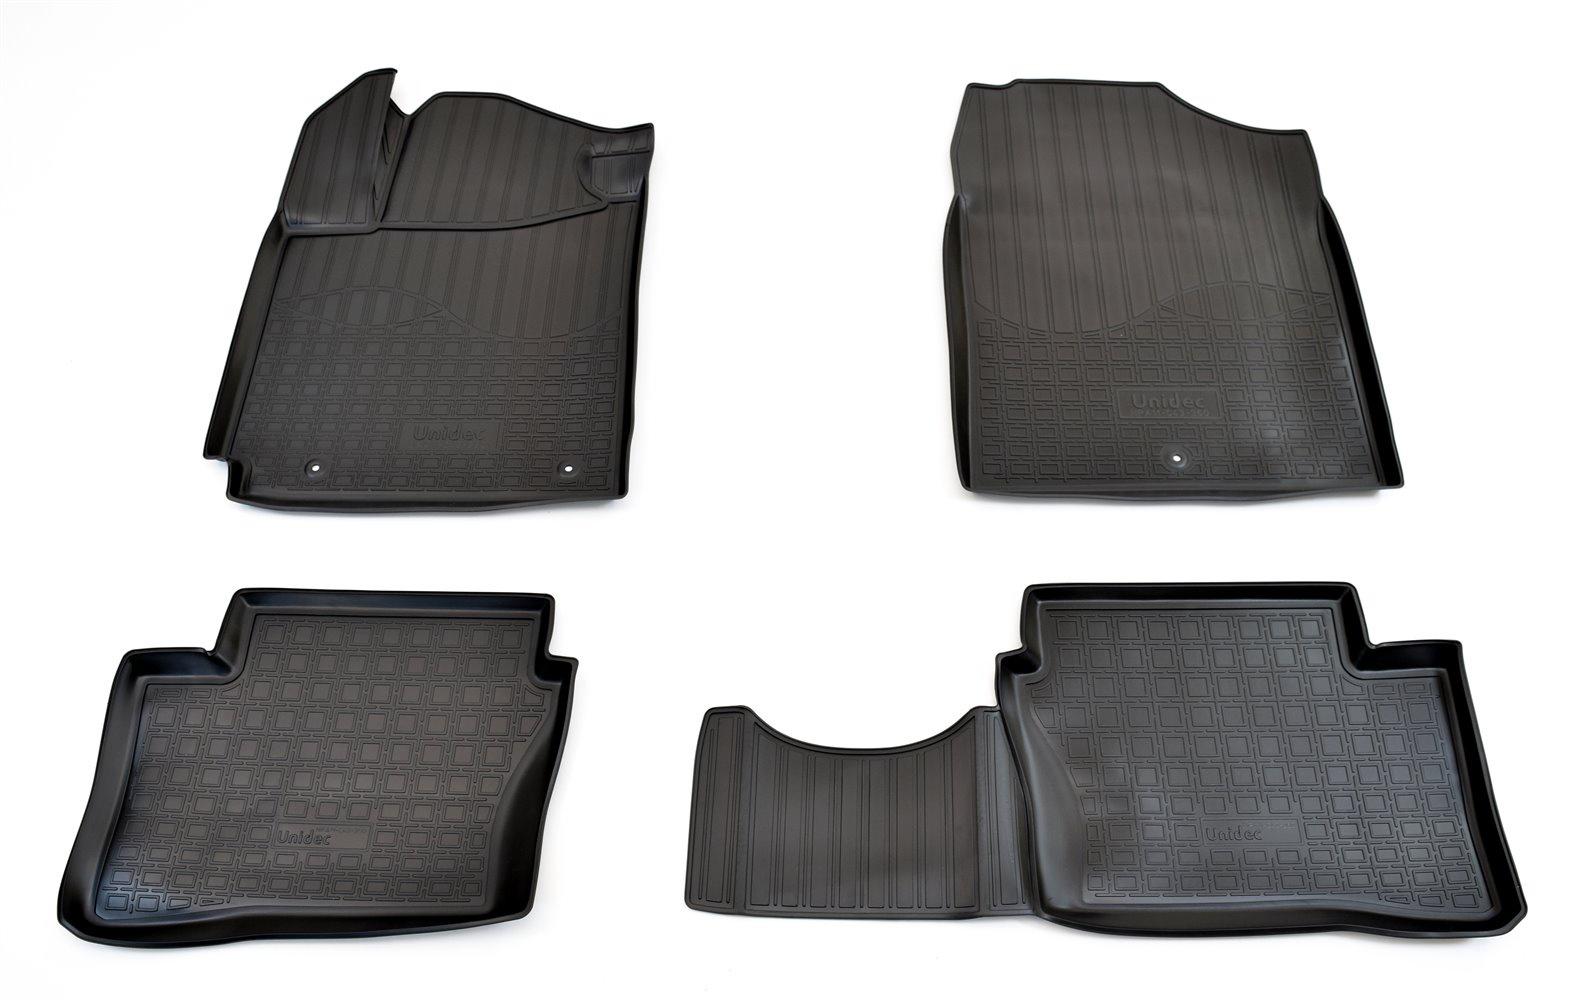 Коврики в салон автомобиля Norplast для Kia Picanto (JA) 3D (2017), NPA11-C43-360, черный масштабная модель kia picanto